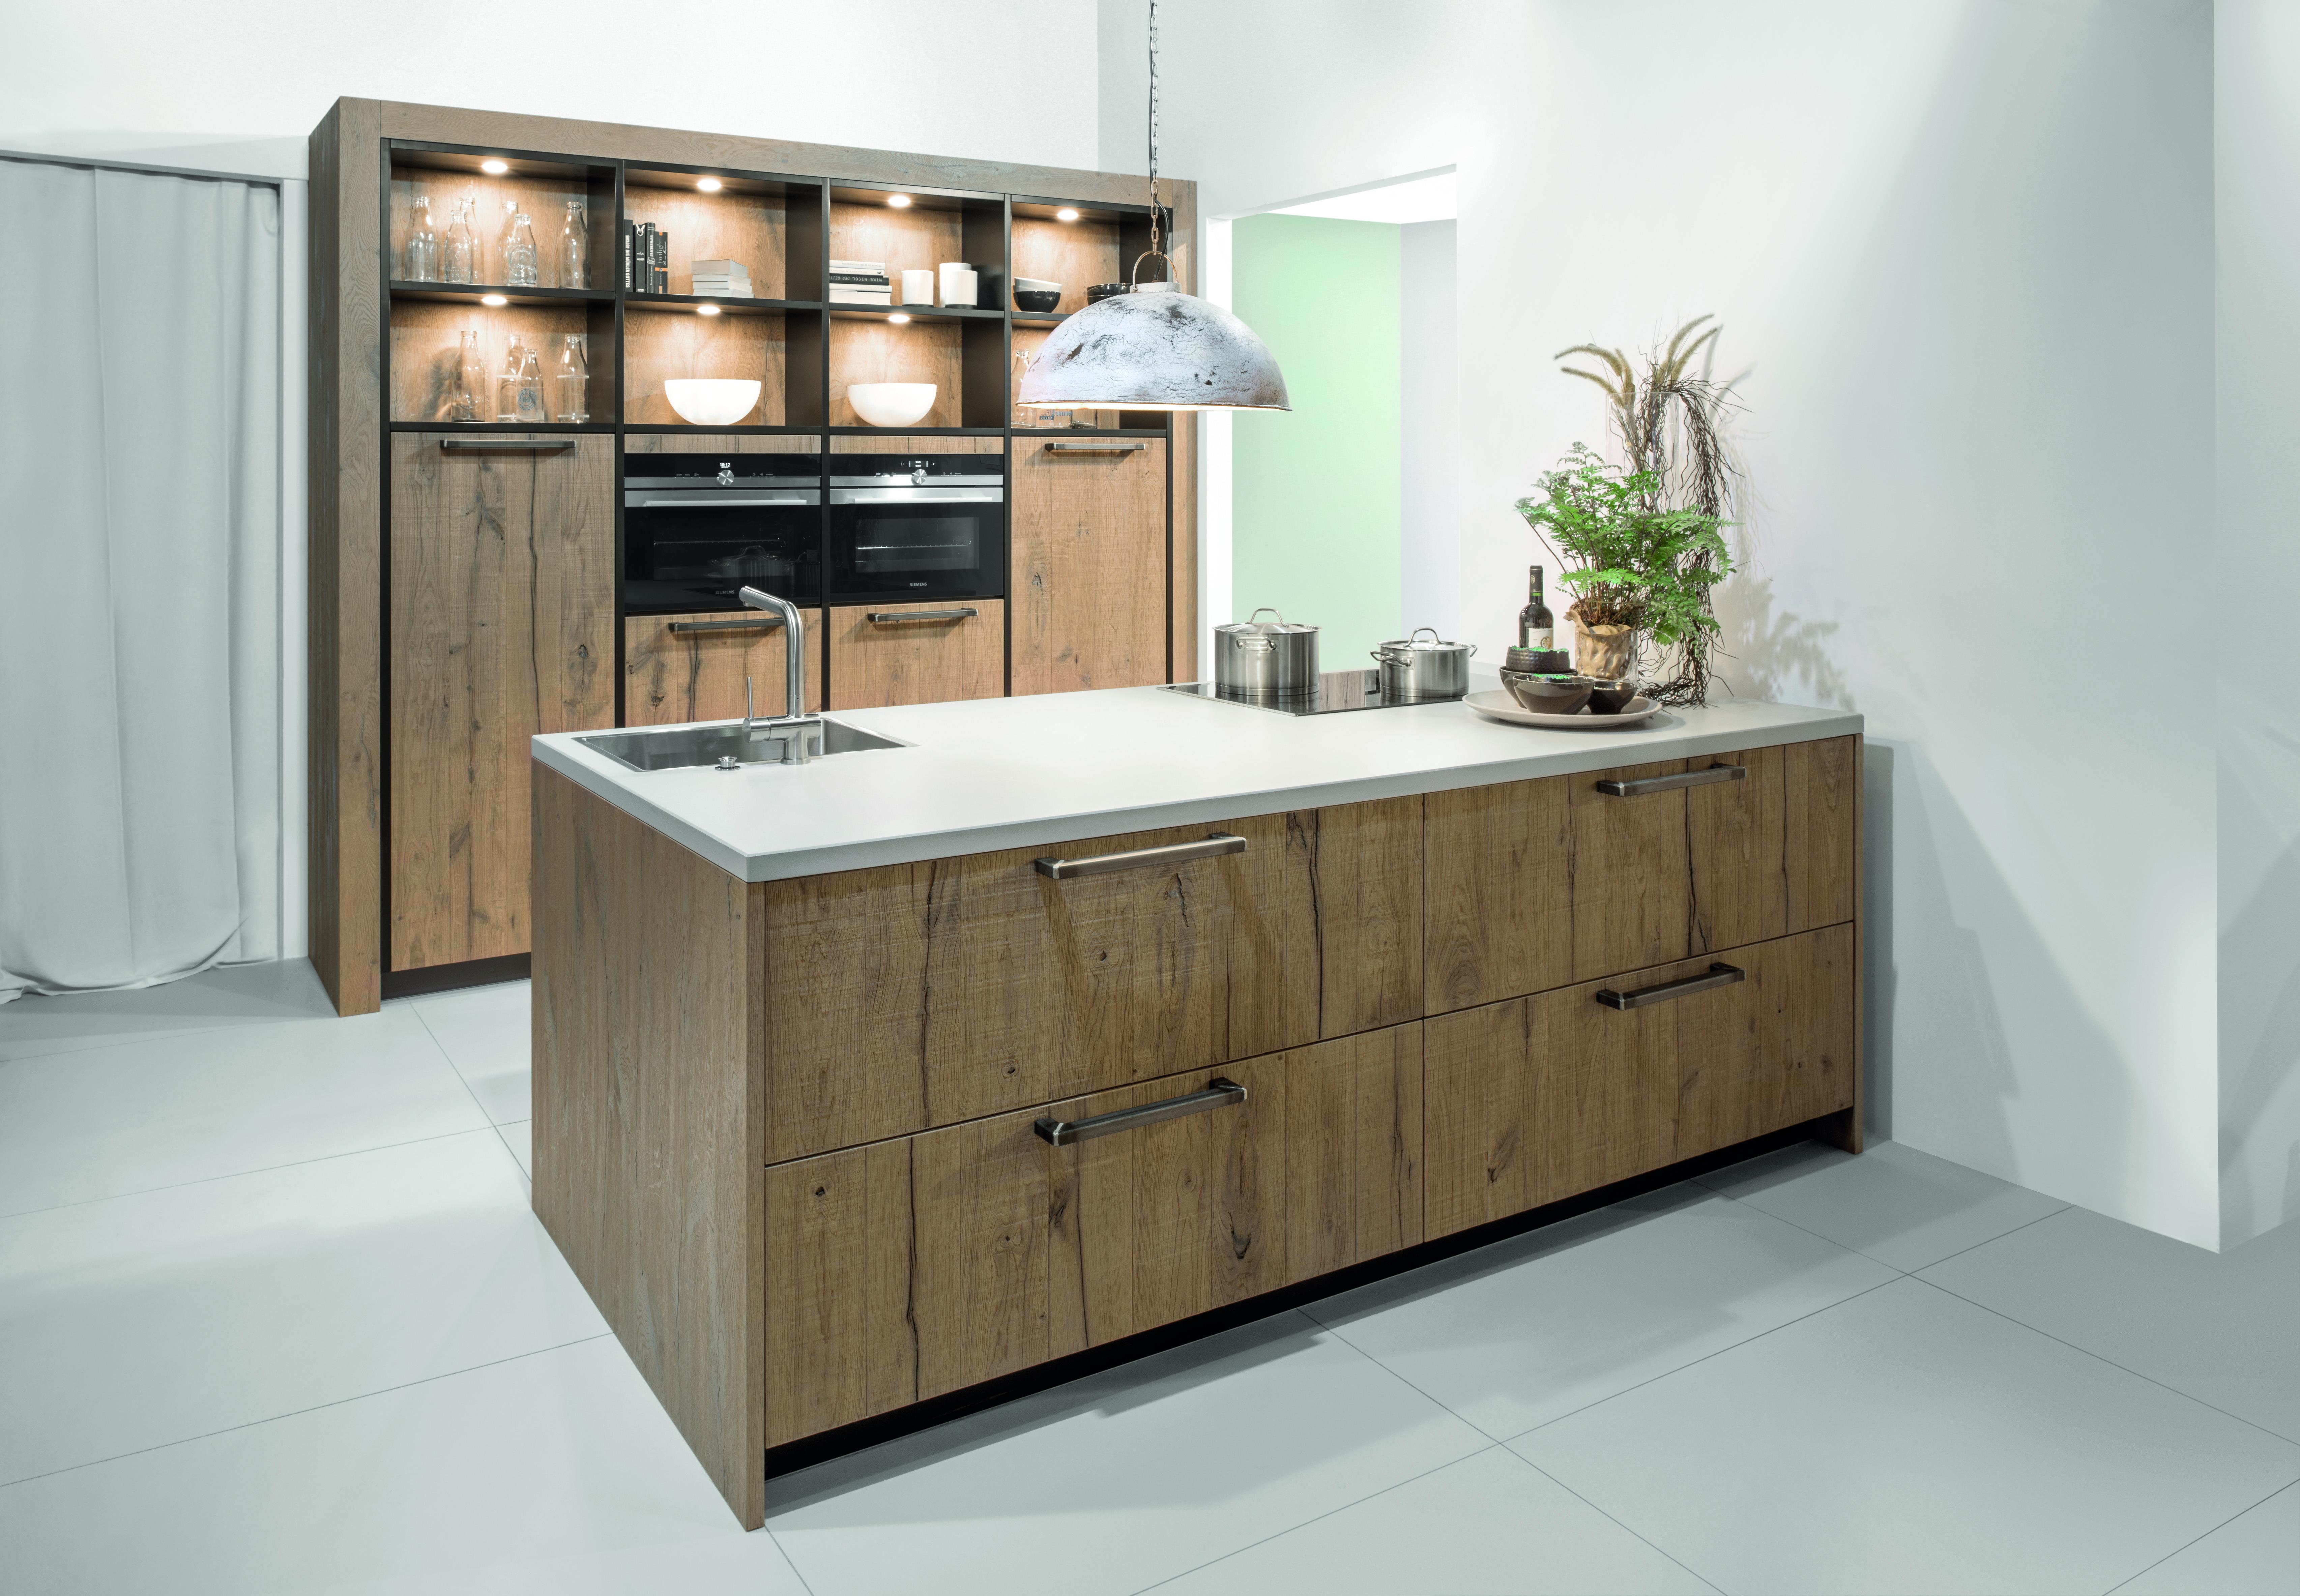 Fotogalerij u2013 meso keukens